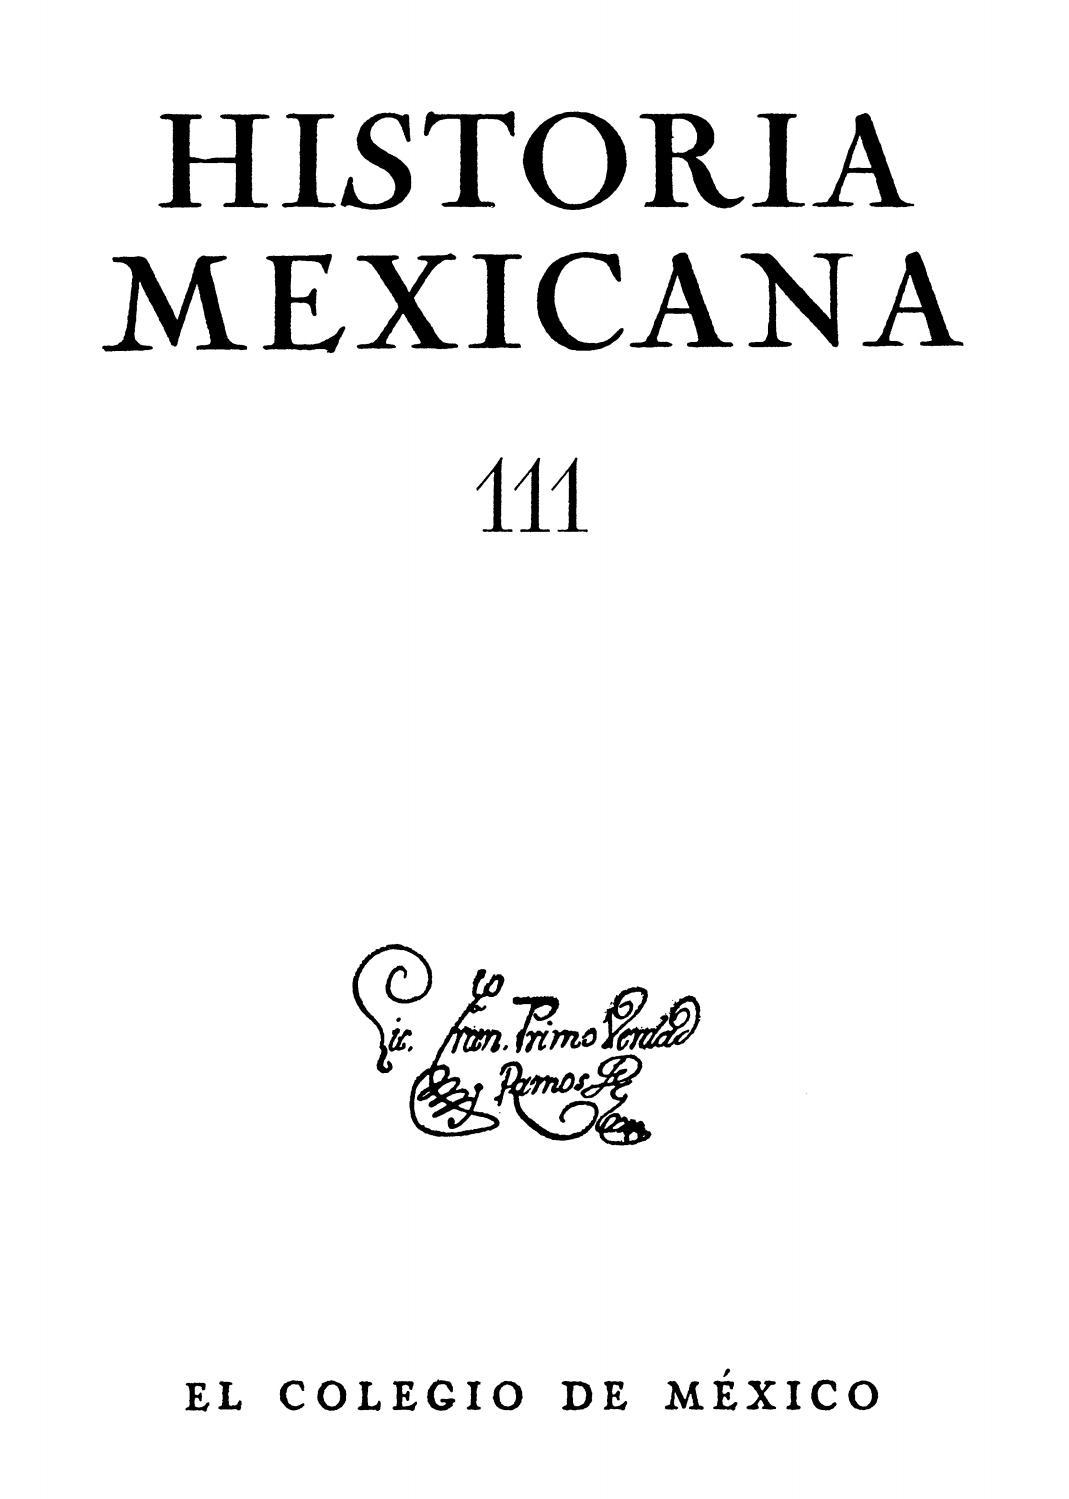 Historia mexicana 111 volumen 28 número 3 by Ce Ocelotl - issuu